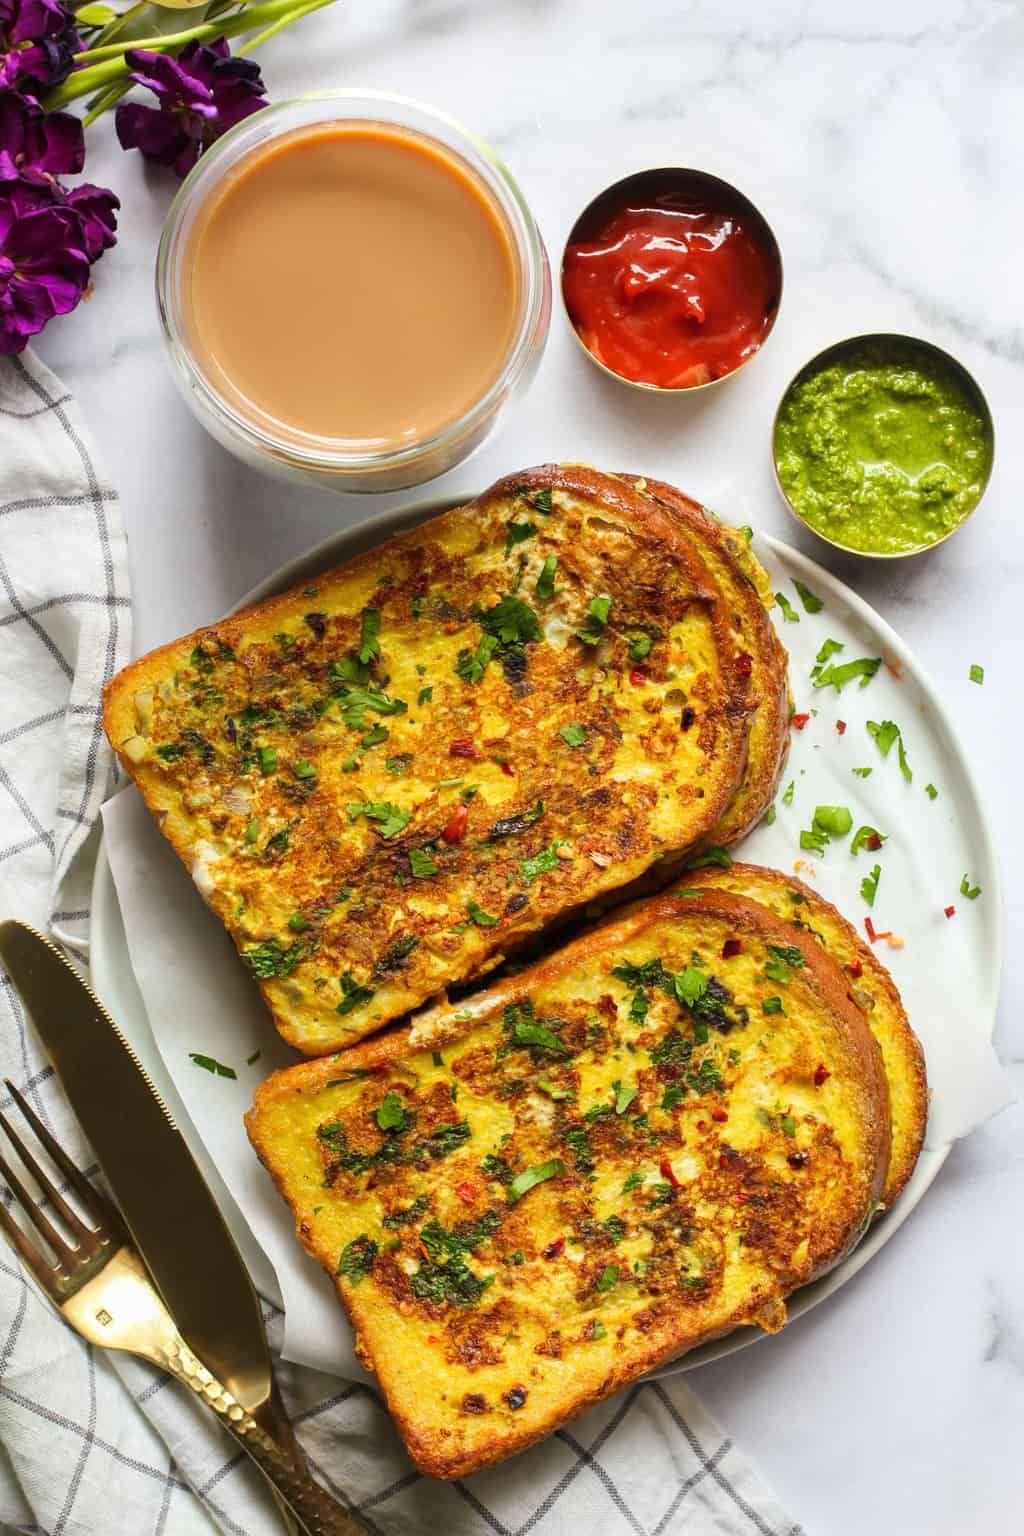 Savory Masala French Toast with Turmeric & Chili